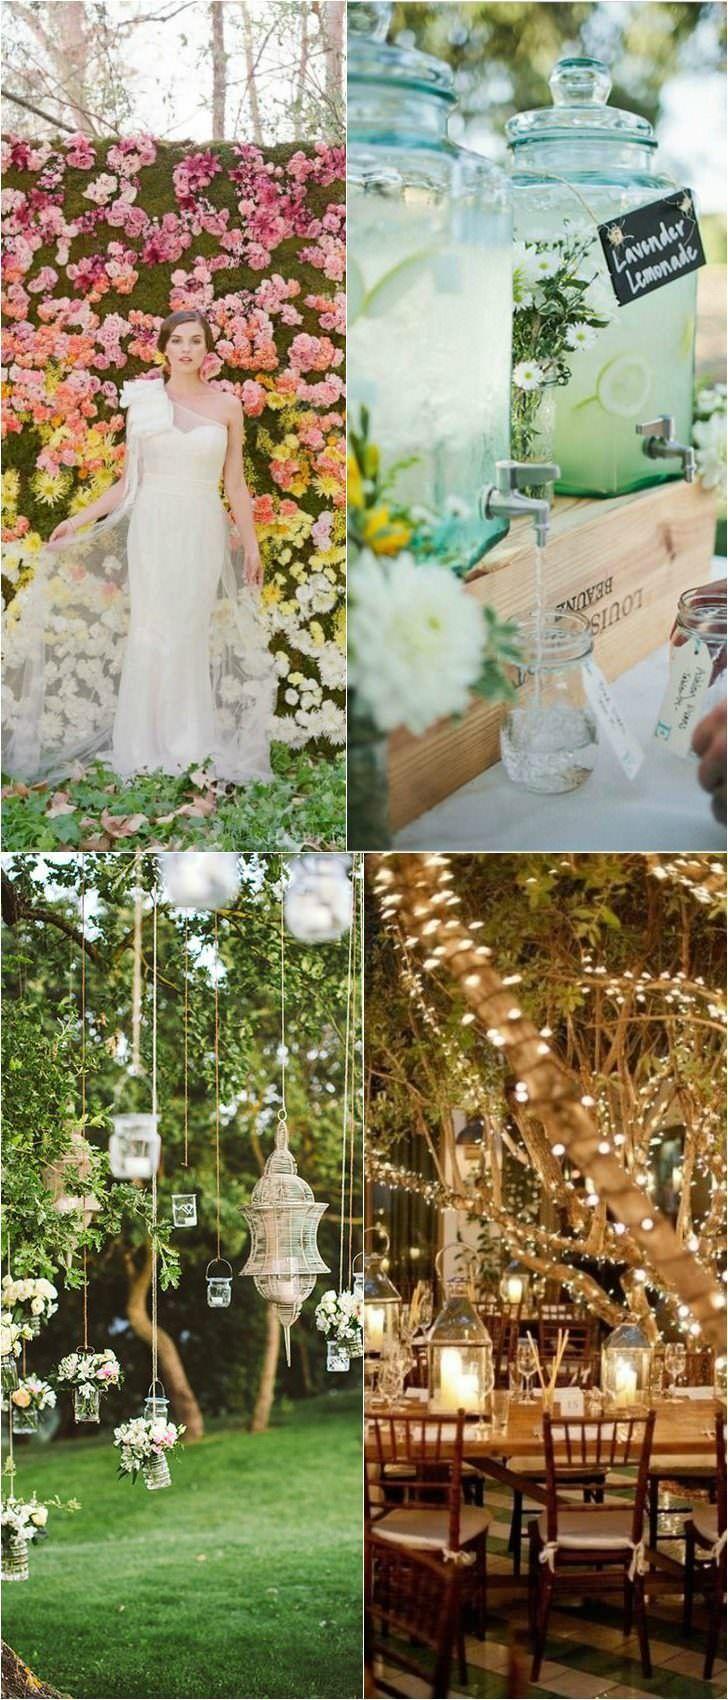 10 Shabby Chic Garden Wedding Decoration Ideas - Garden Decor - 1 ...